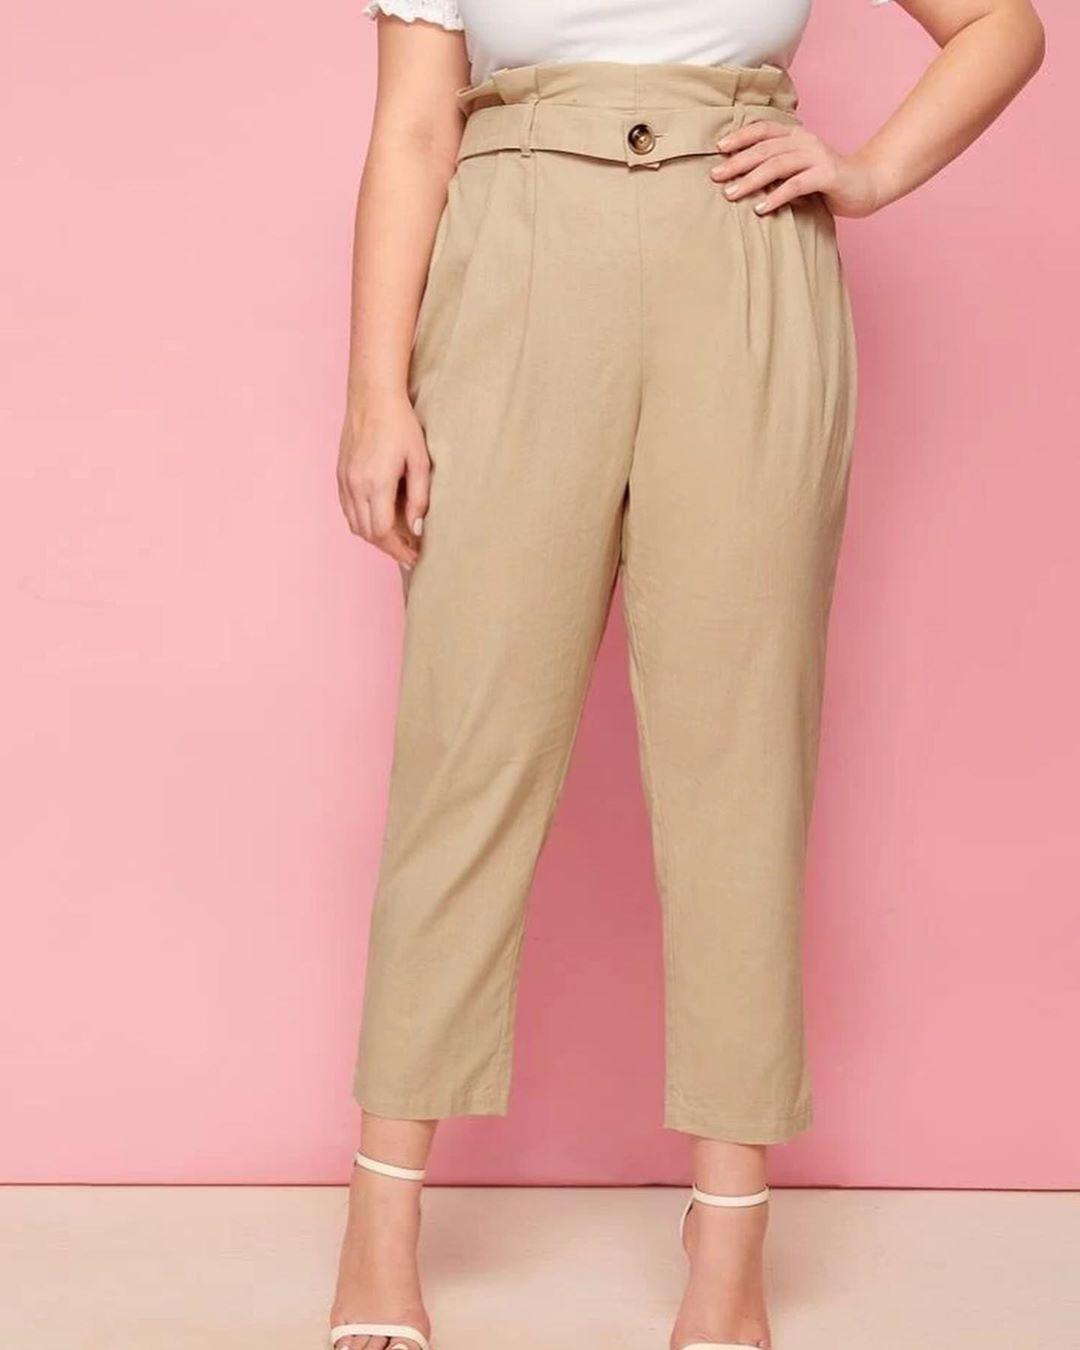 pantalon curvy